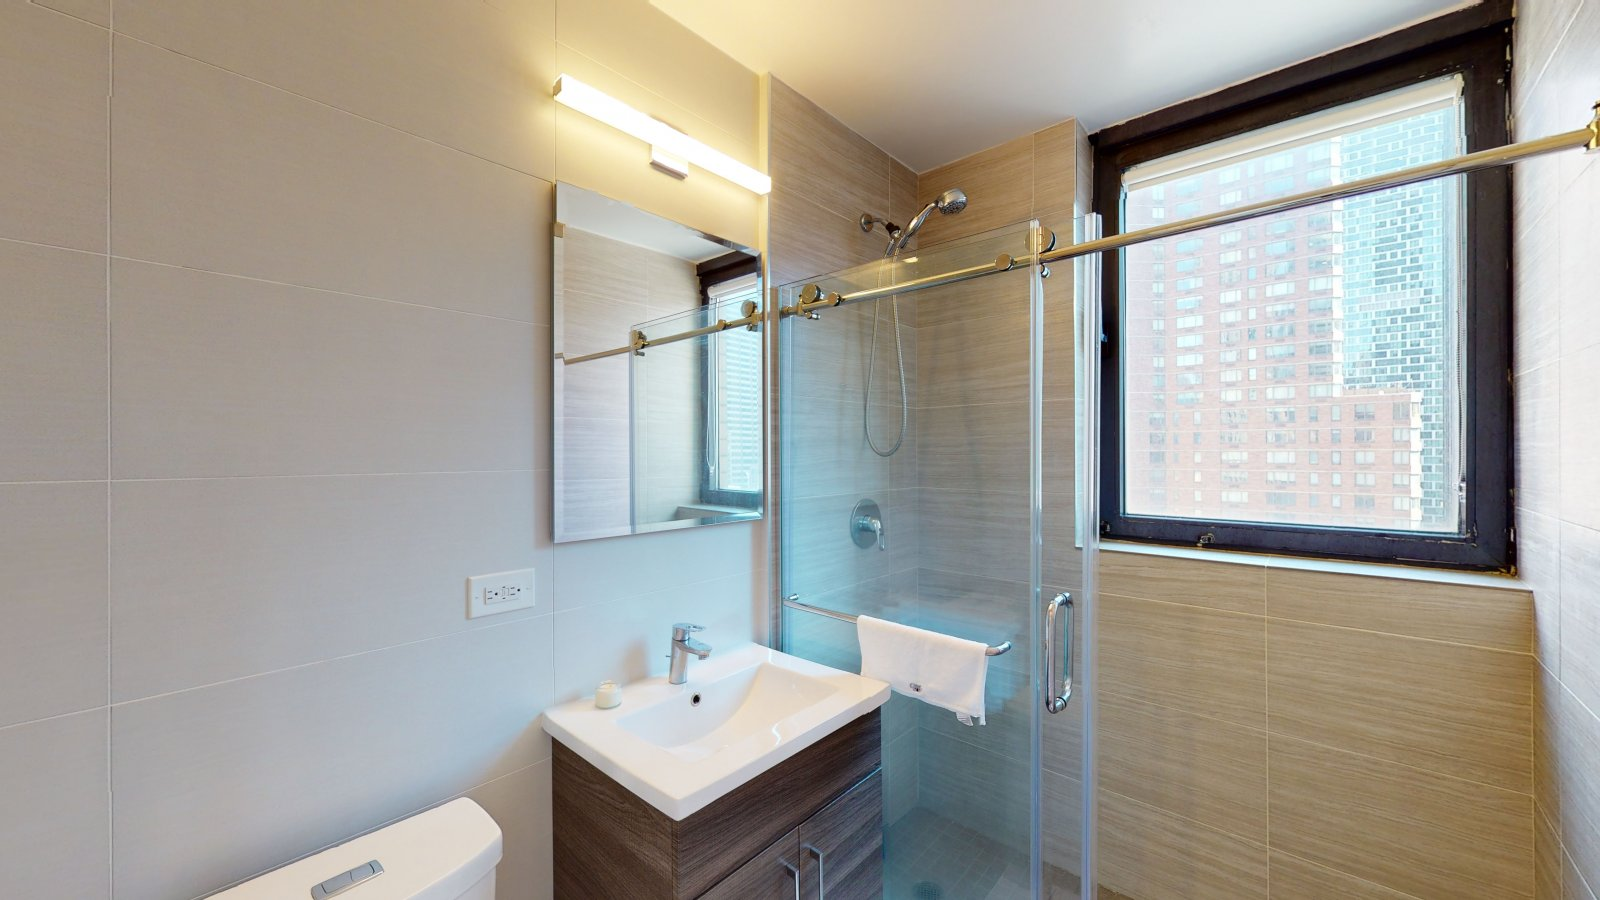 235 W 48th Street Unit 22L Bathroom of this Times Square adjacent rental apartment.